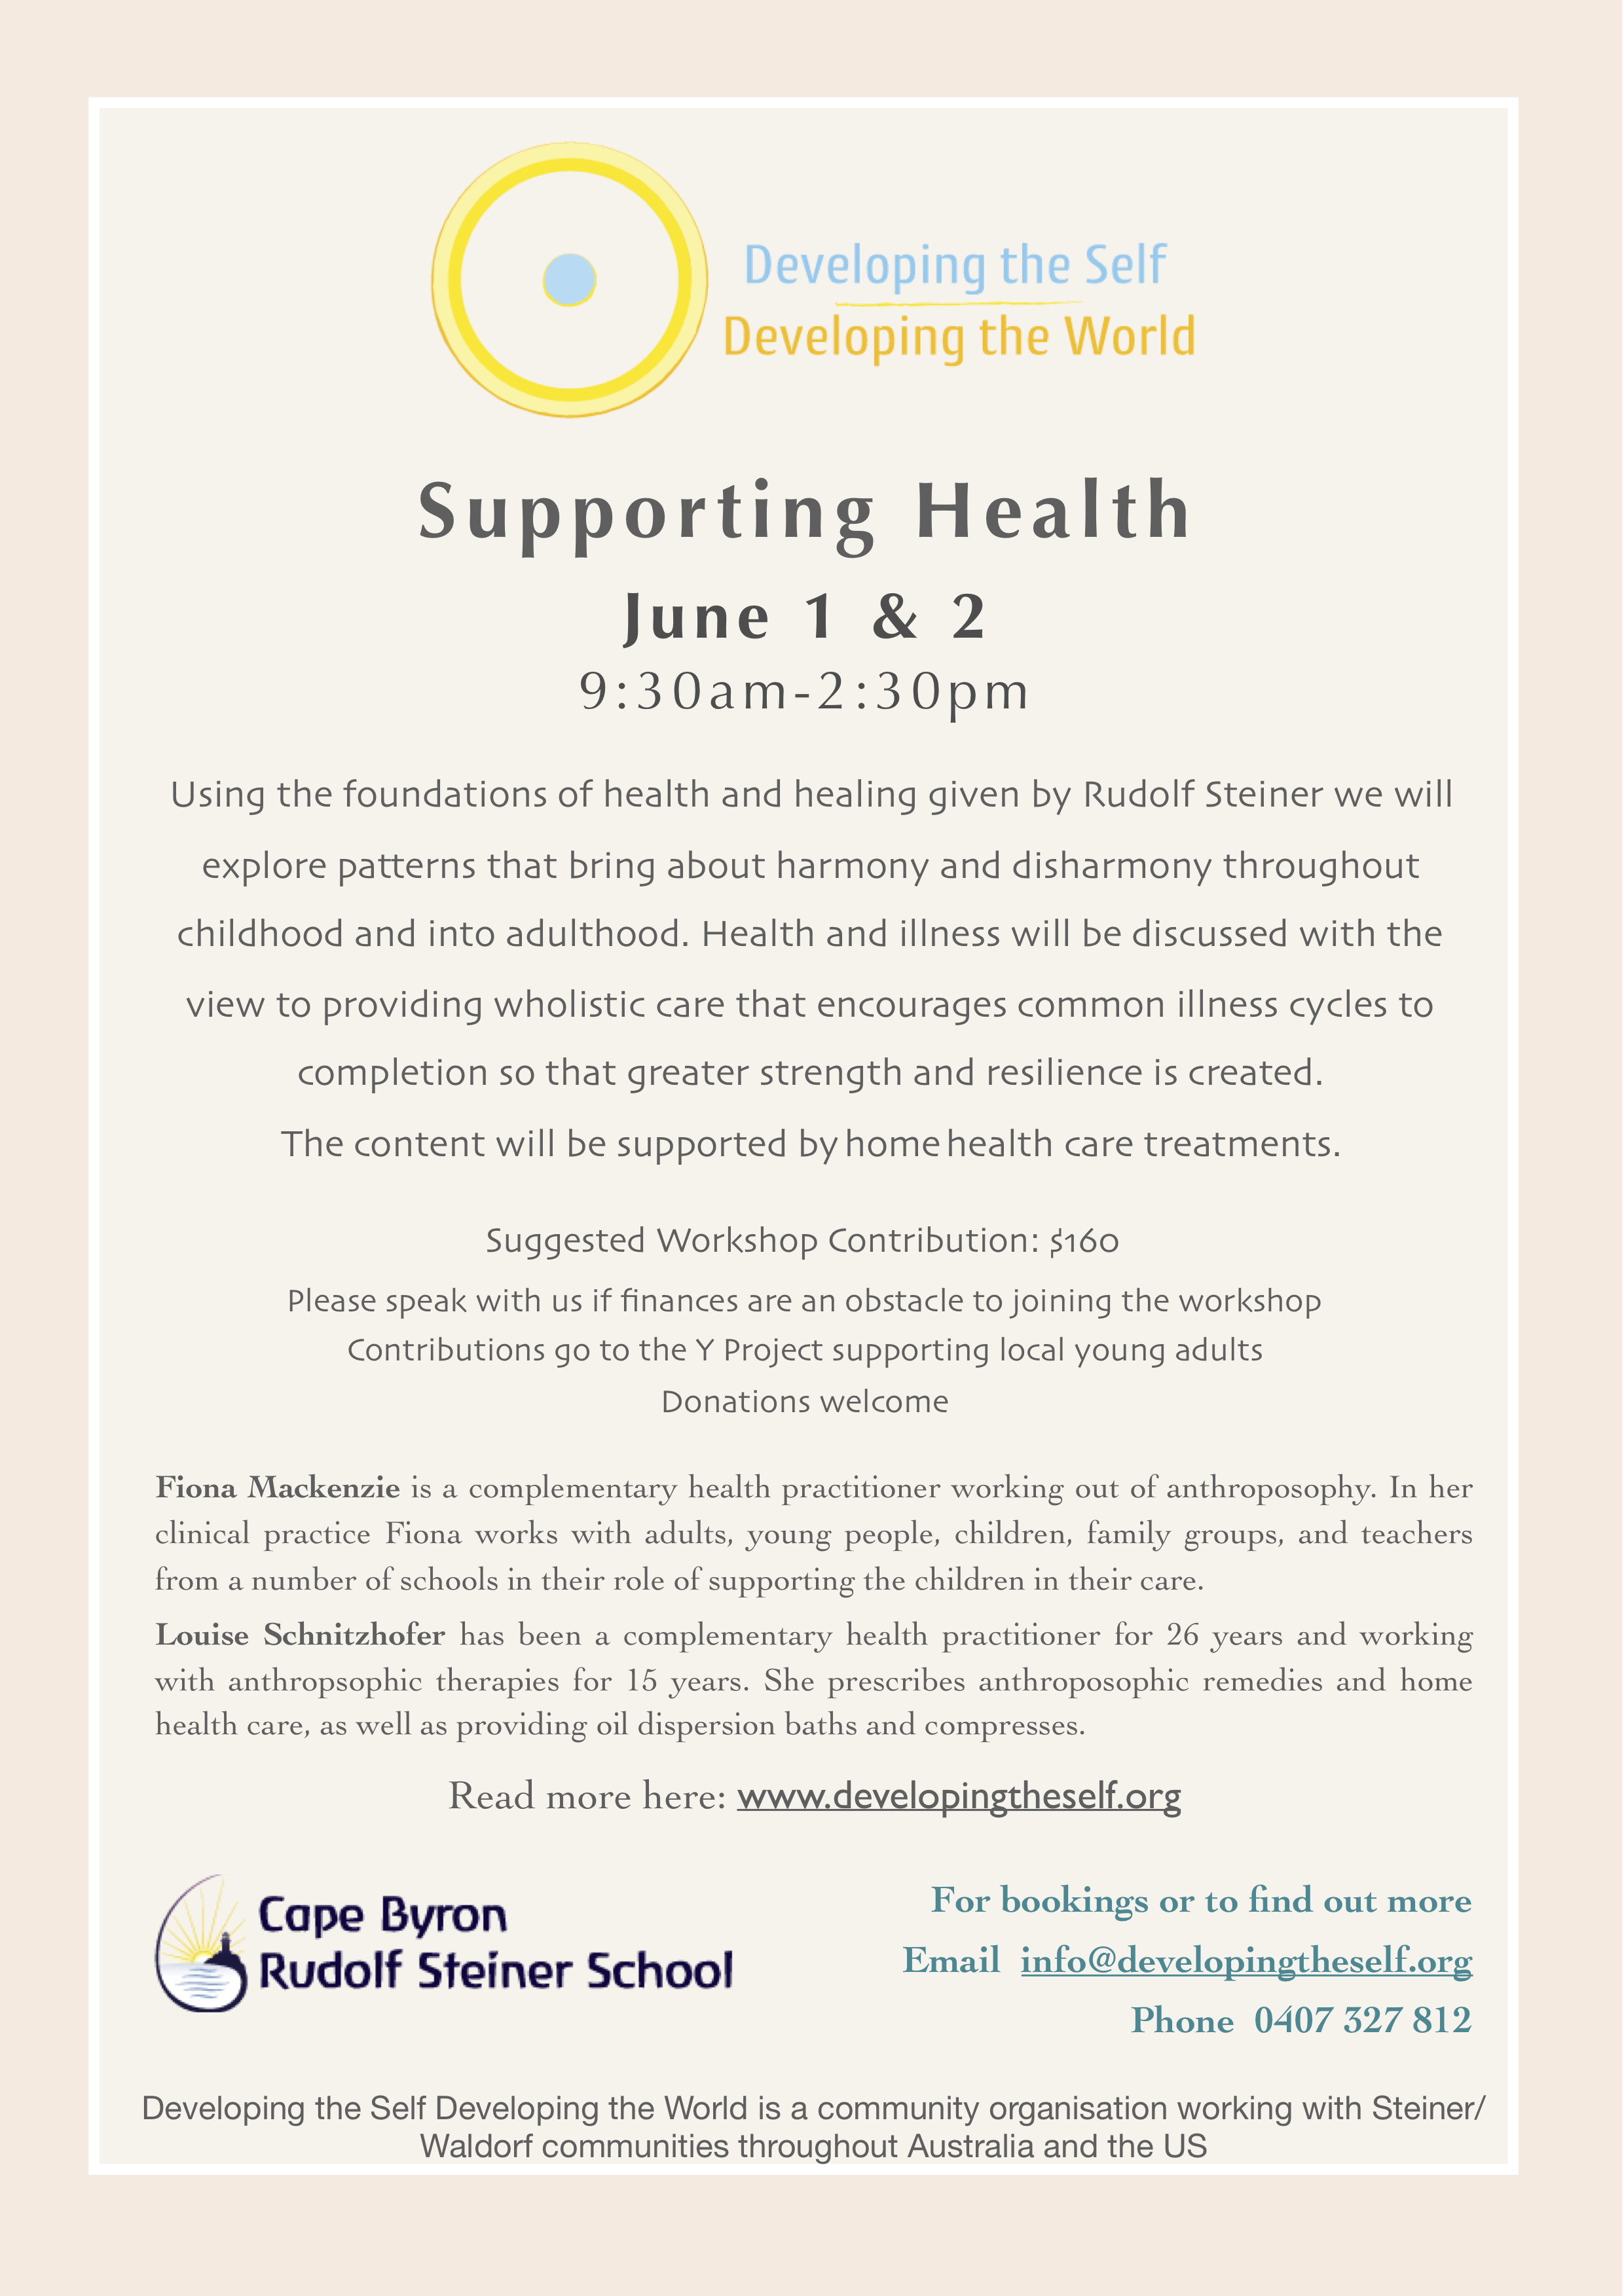 Supporting Health_CBRSS_June 1_2 copy.jpg